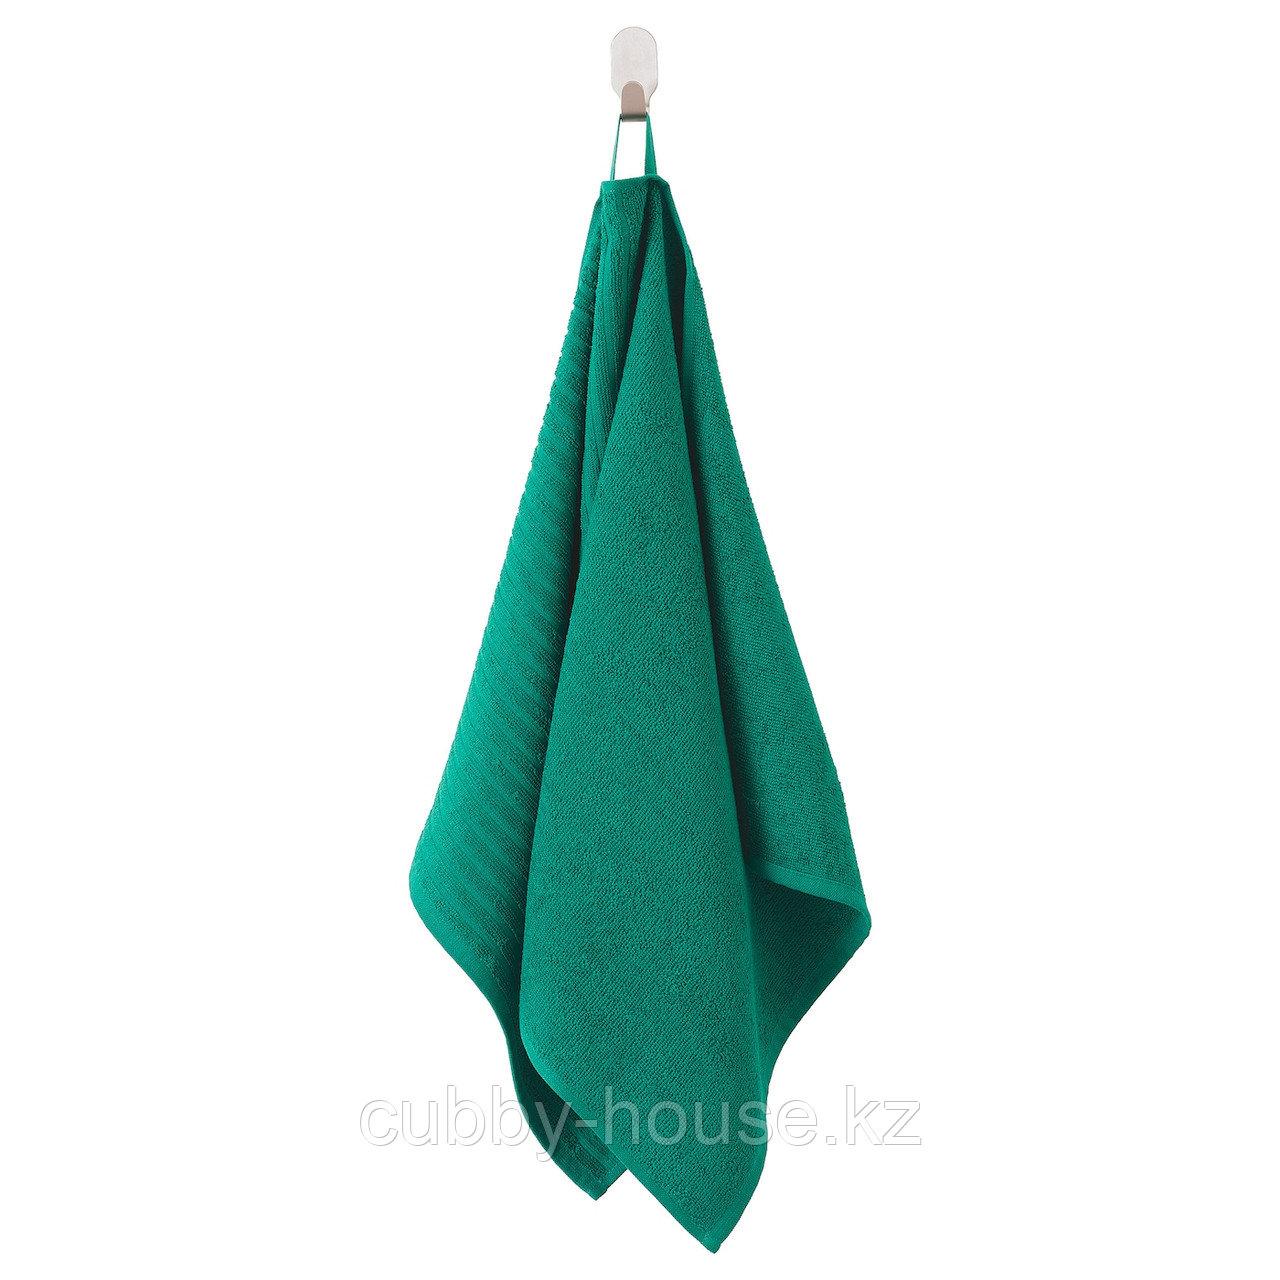 ВОГШЁН Полотенце, темно-зеленый, 50x100 см